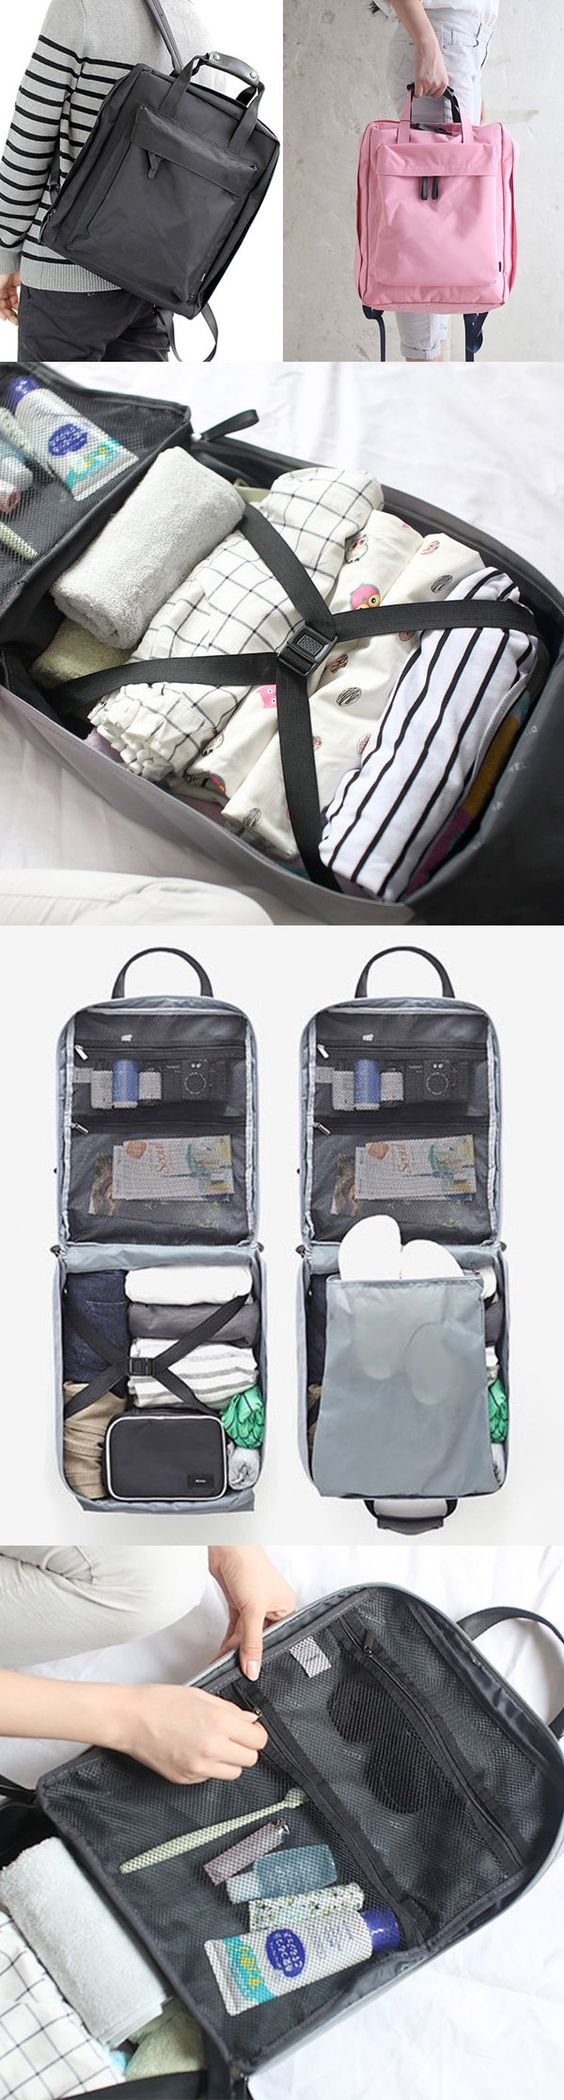 US$22.35 Travel Waterproof Nylon Storage Backpack, Outdoor Women Men Unisex Handbag,Outdoor Backpack,Travel Bag,Travel Tips Packing